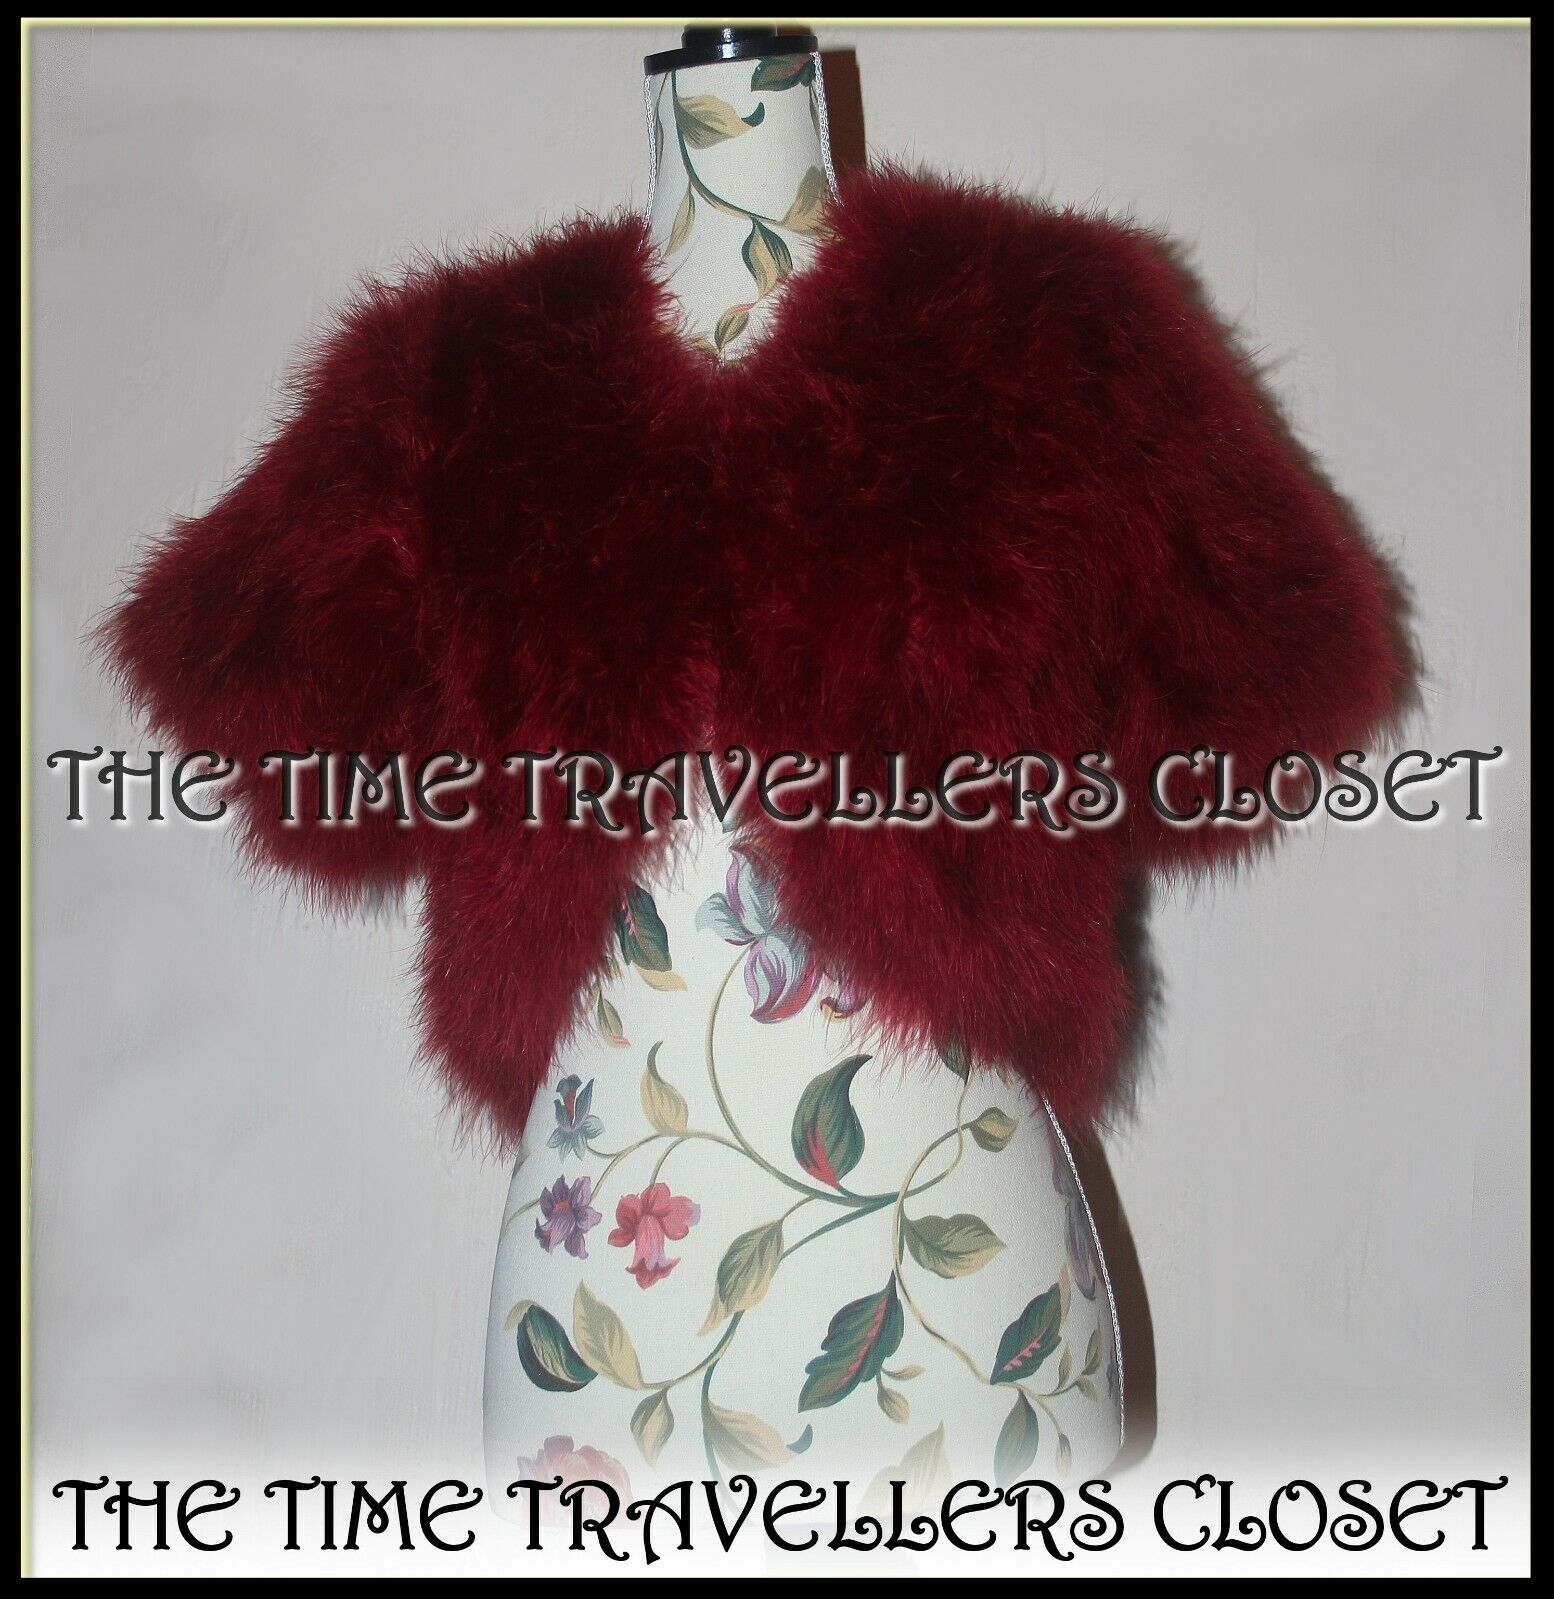 BNWT Biba Rare Claret Red Wine Marabou Feather Bolero Jacket Small UK 10 6 38